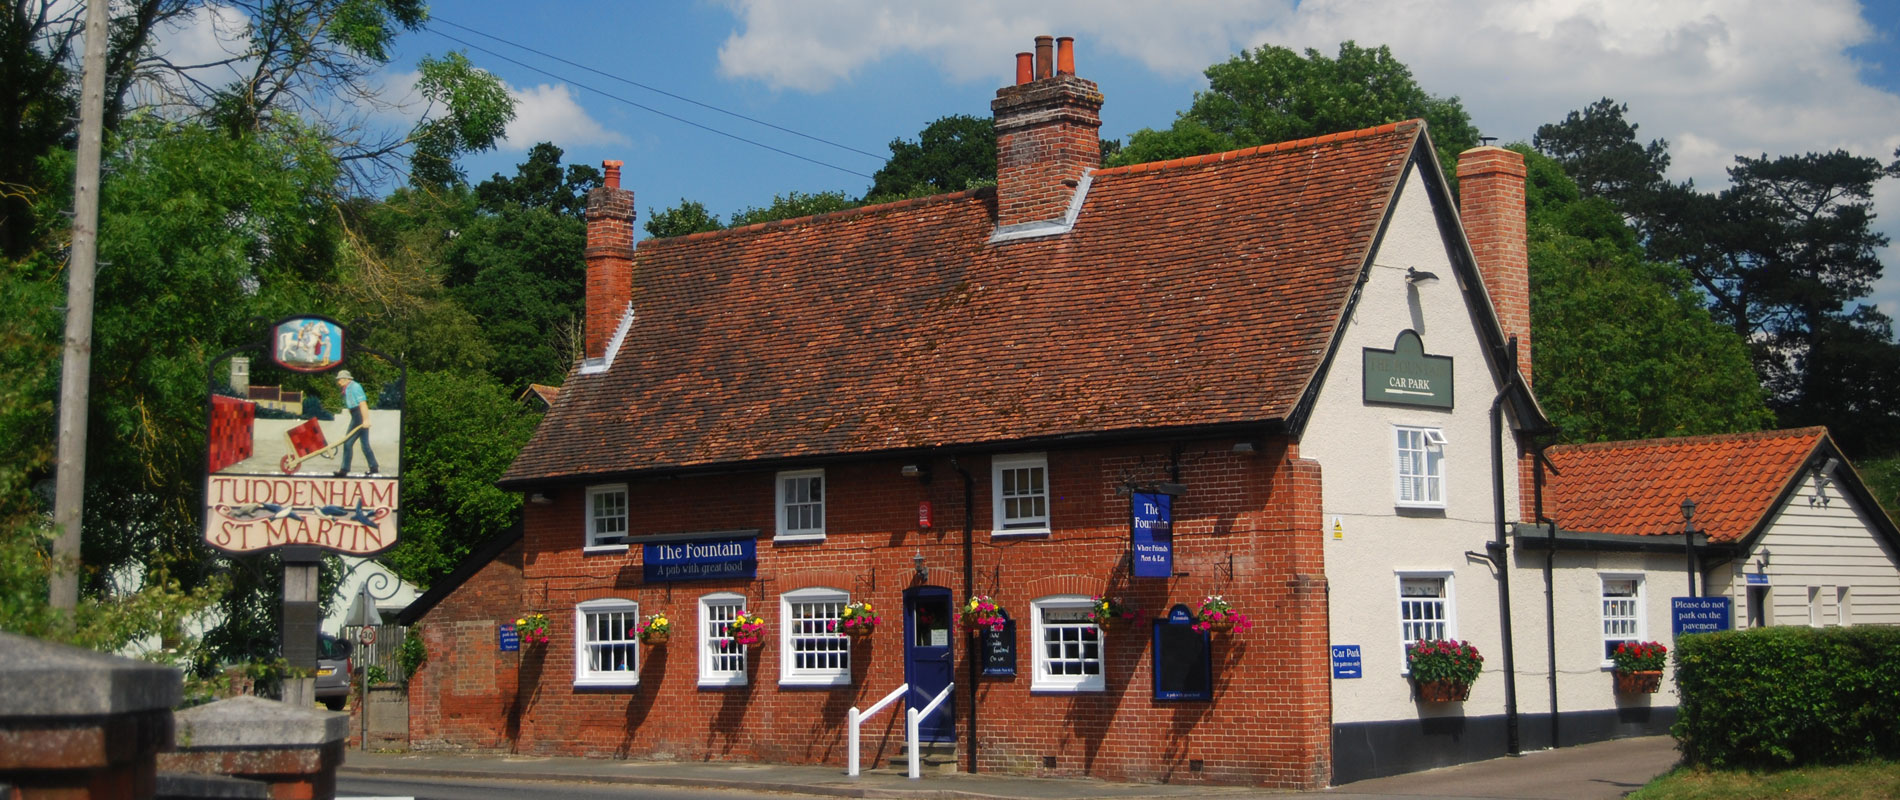 The Fountain Pub at Tuddenham